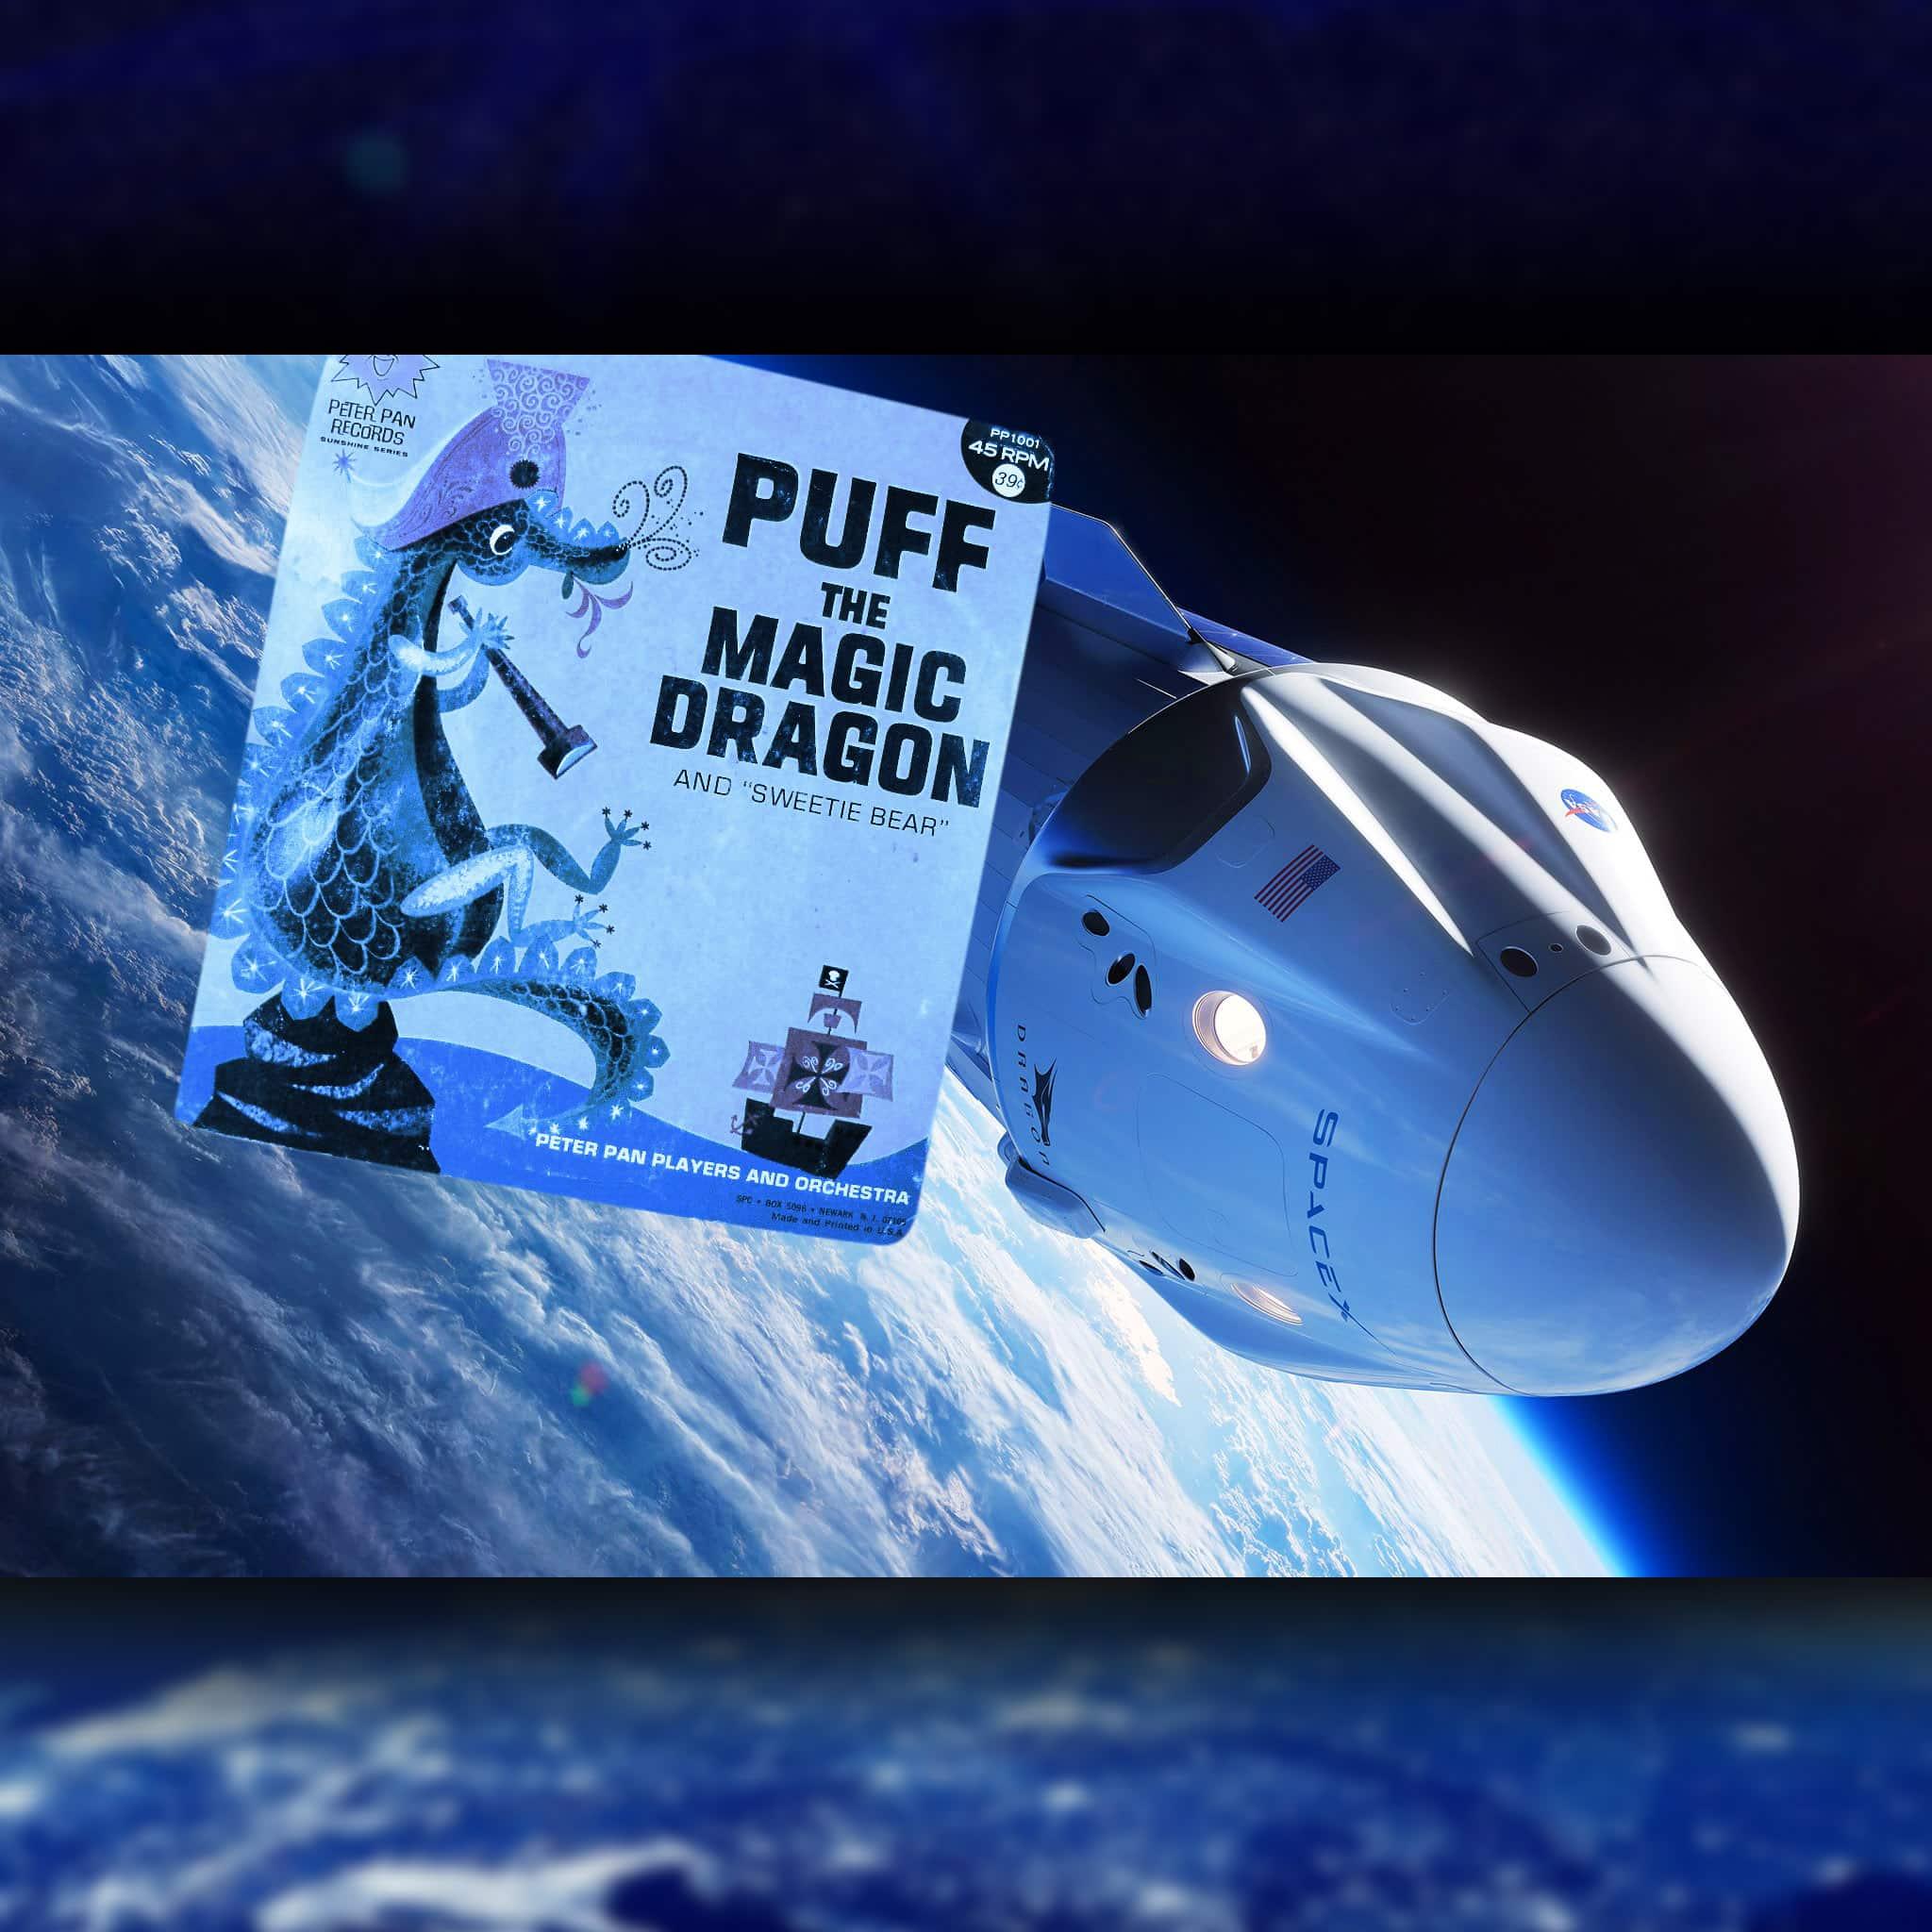 Crew Dragon DM-1 SpaceX-2 - Puff the Magic Dragon